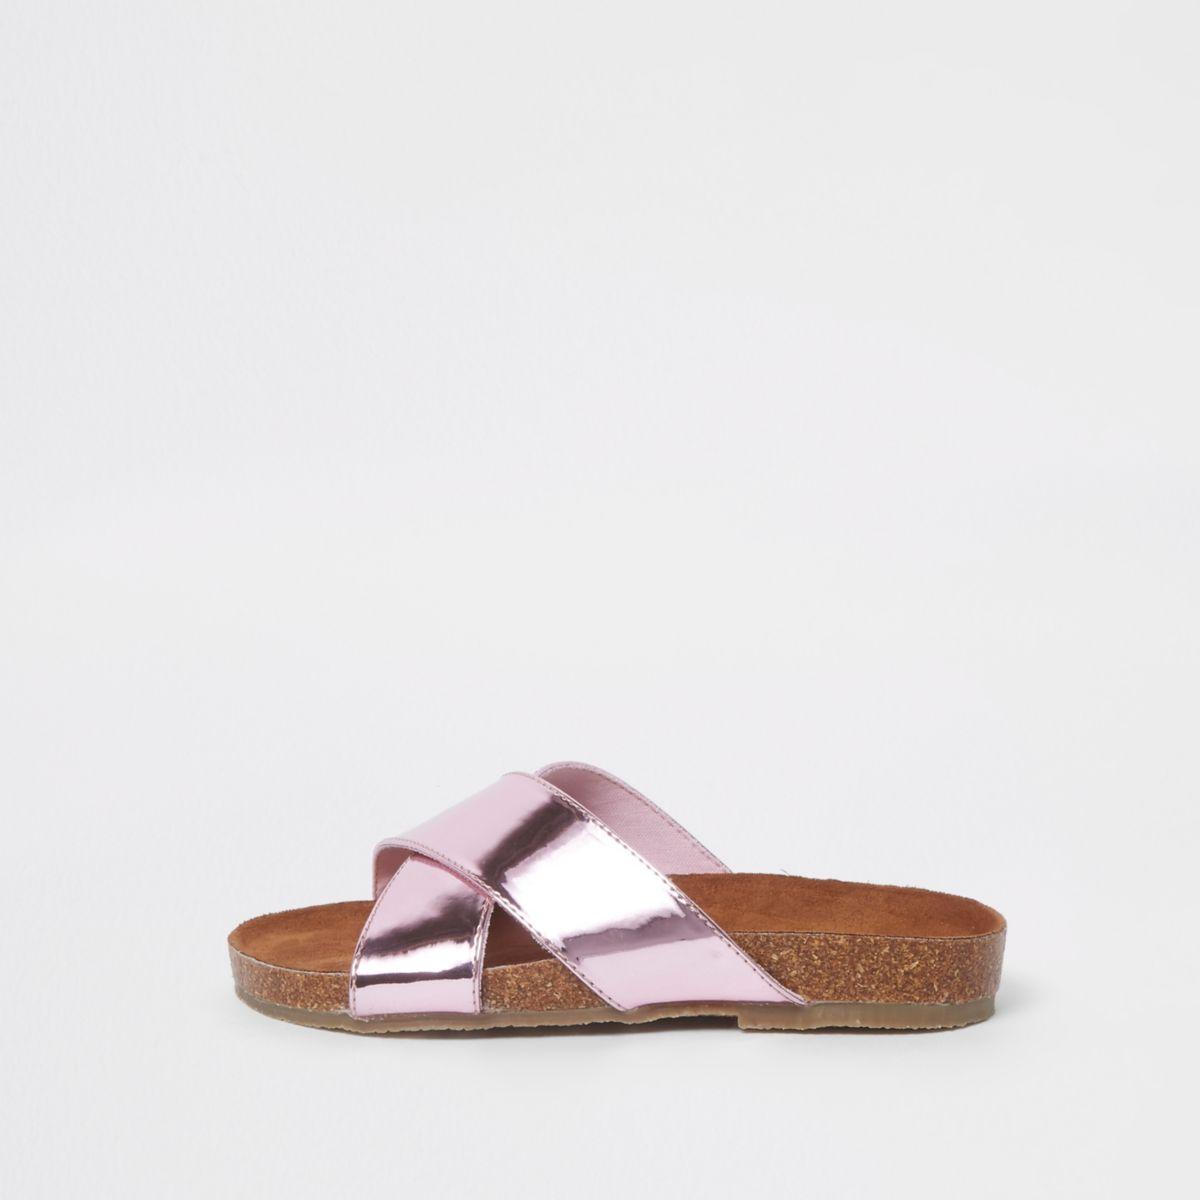 Girls pink metallic cross strap sandals